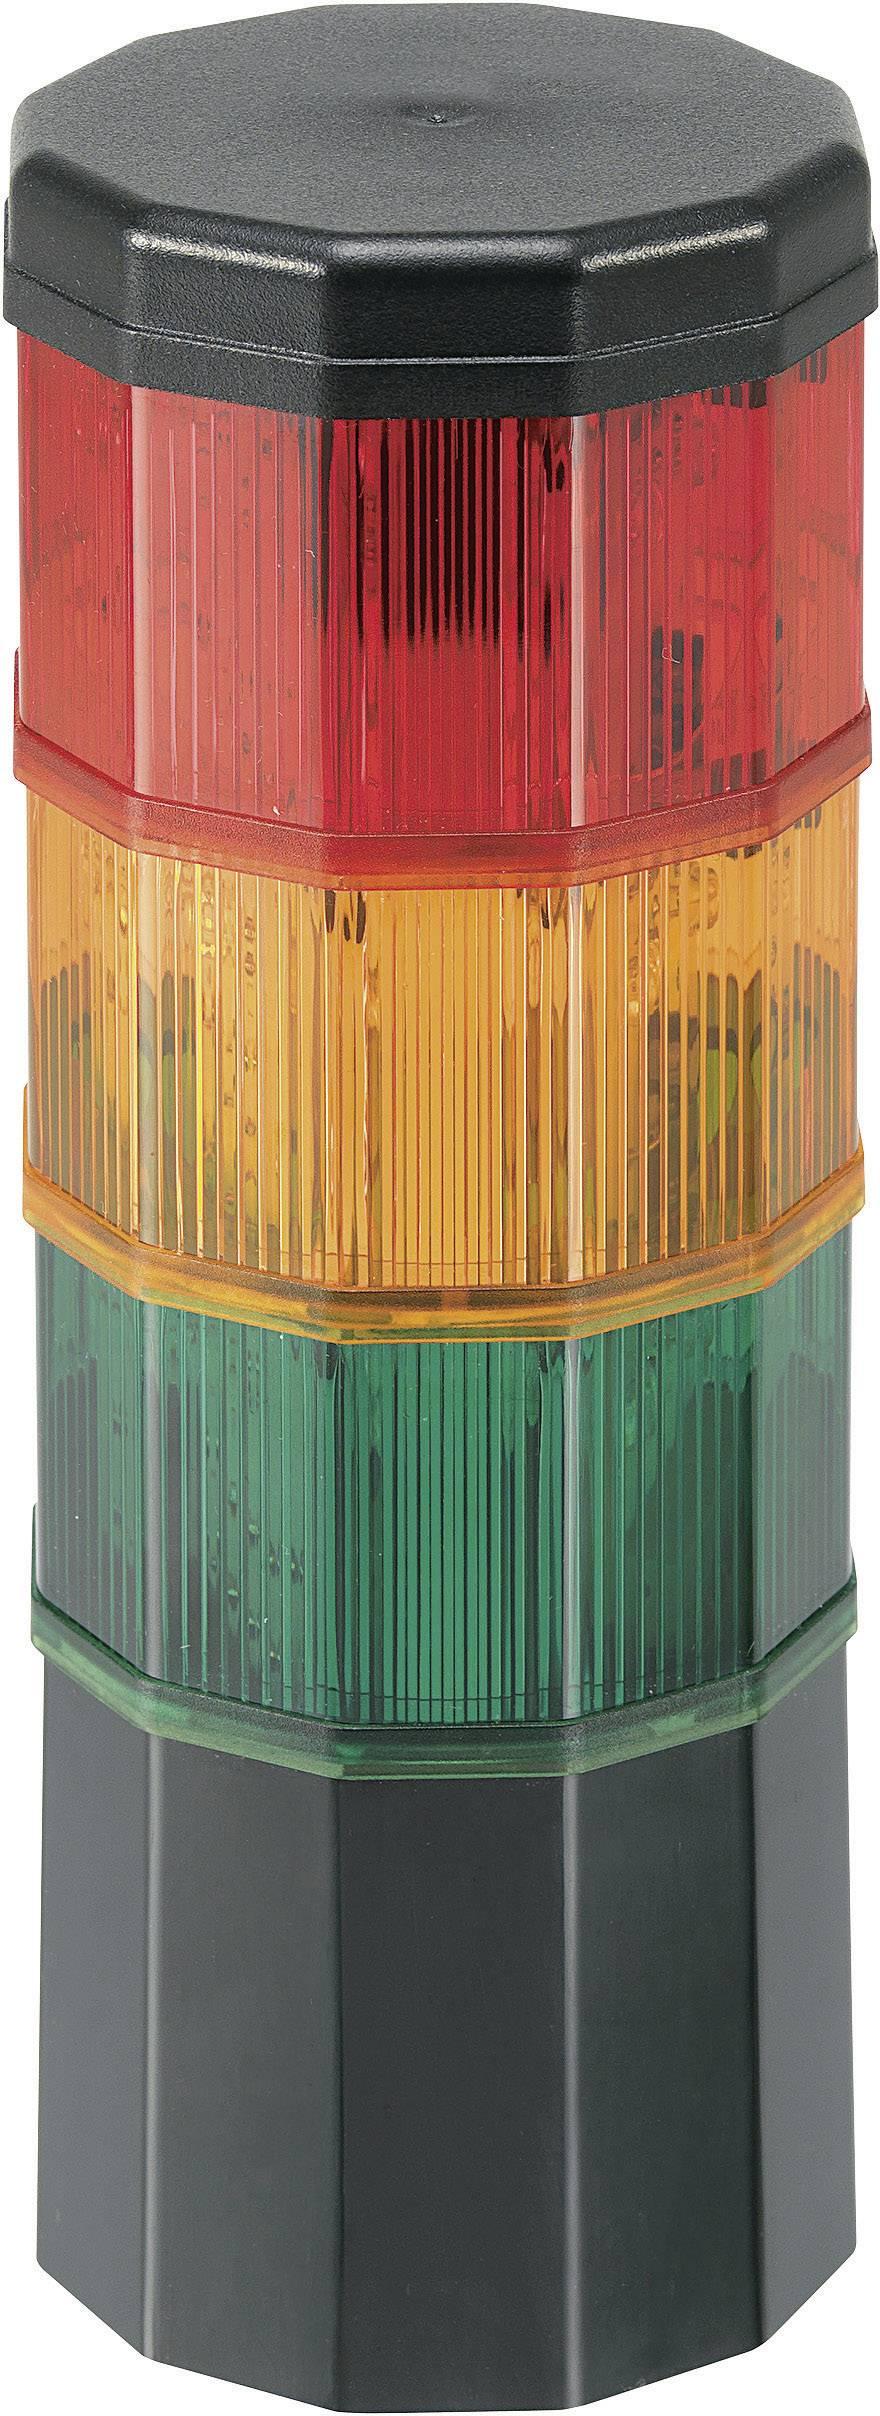 Signalizačný stĺpik Werma Signaltechnik CST 60 696.009.75, 24 V/AC, 24 V/DC, červená, žltá, zelená